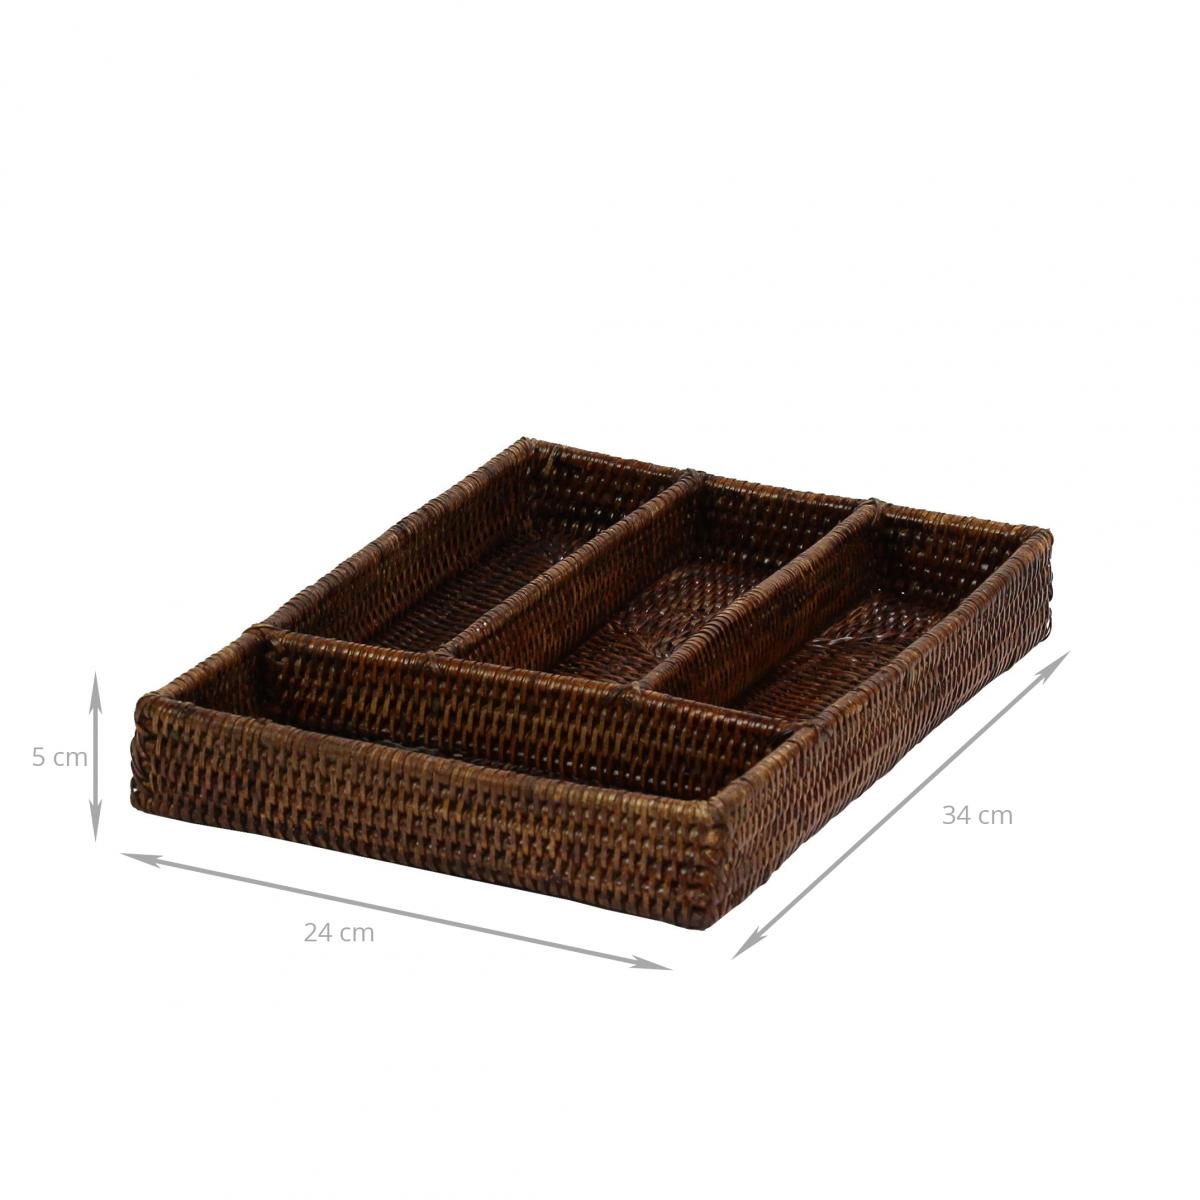 range couverts en rotin tress 4 compartiments cuisine. Black Bedroom Furniture Sets. Home Design Ideas